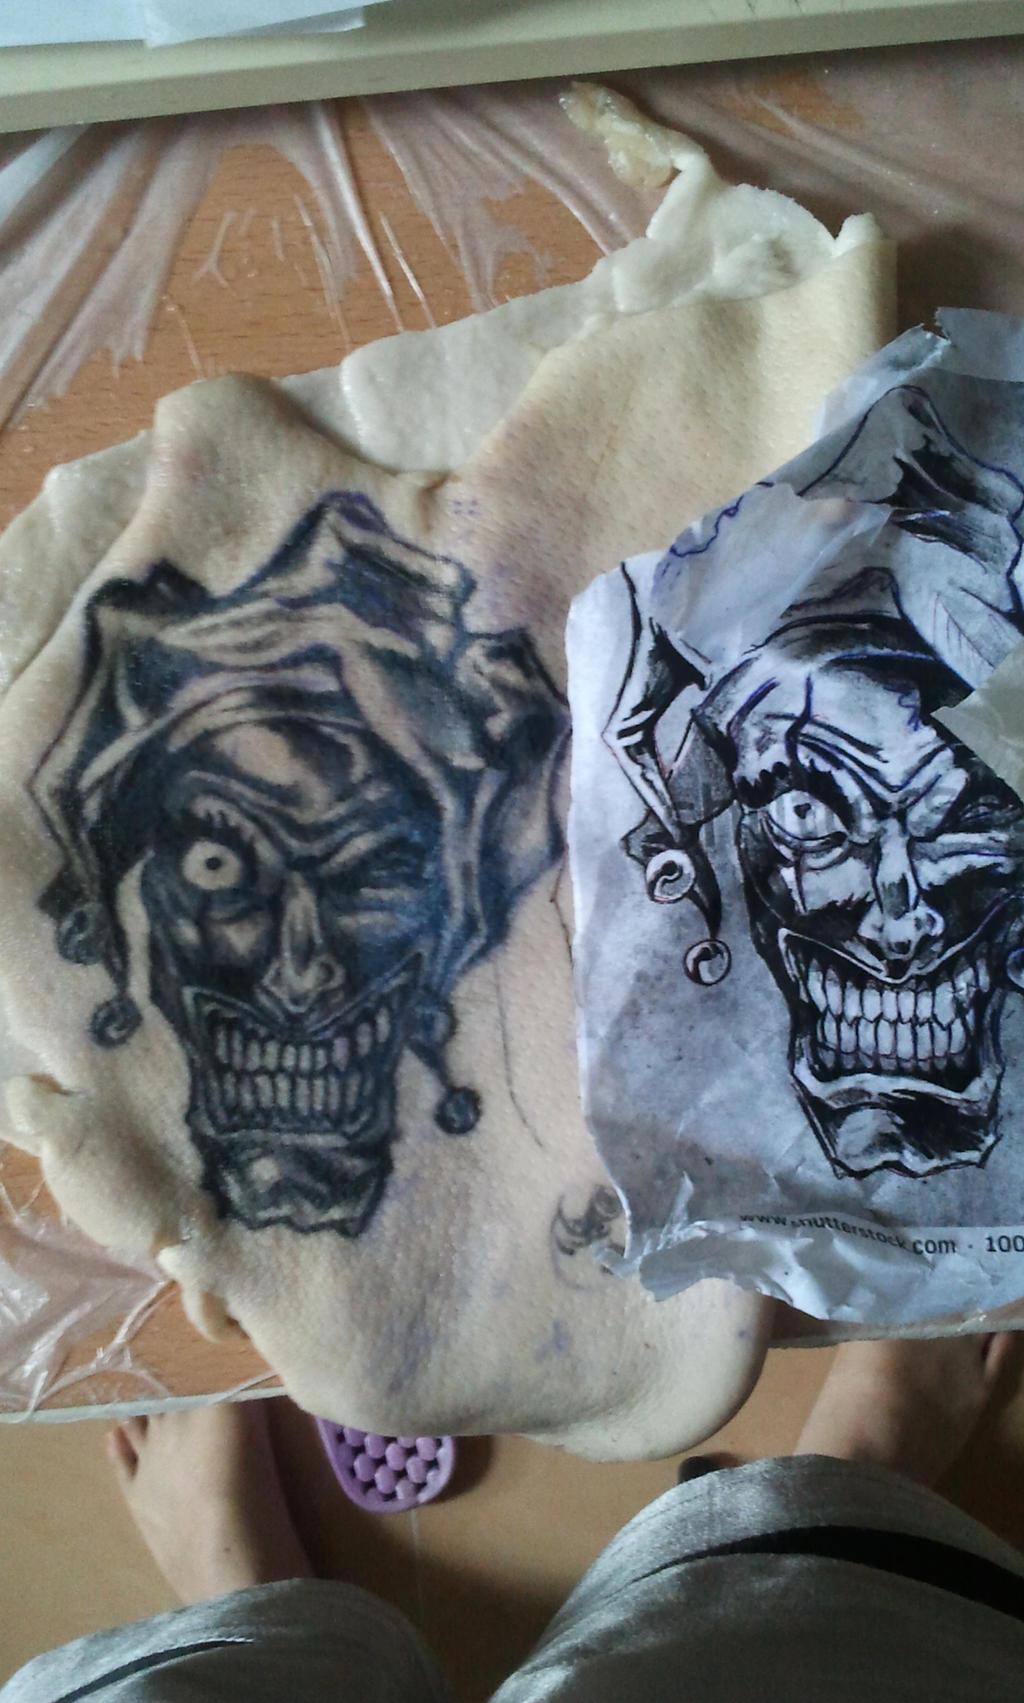 Clown tattoo pratice on pig skin by tommyyu on deviantart for Pig skin tattoo